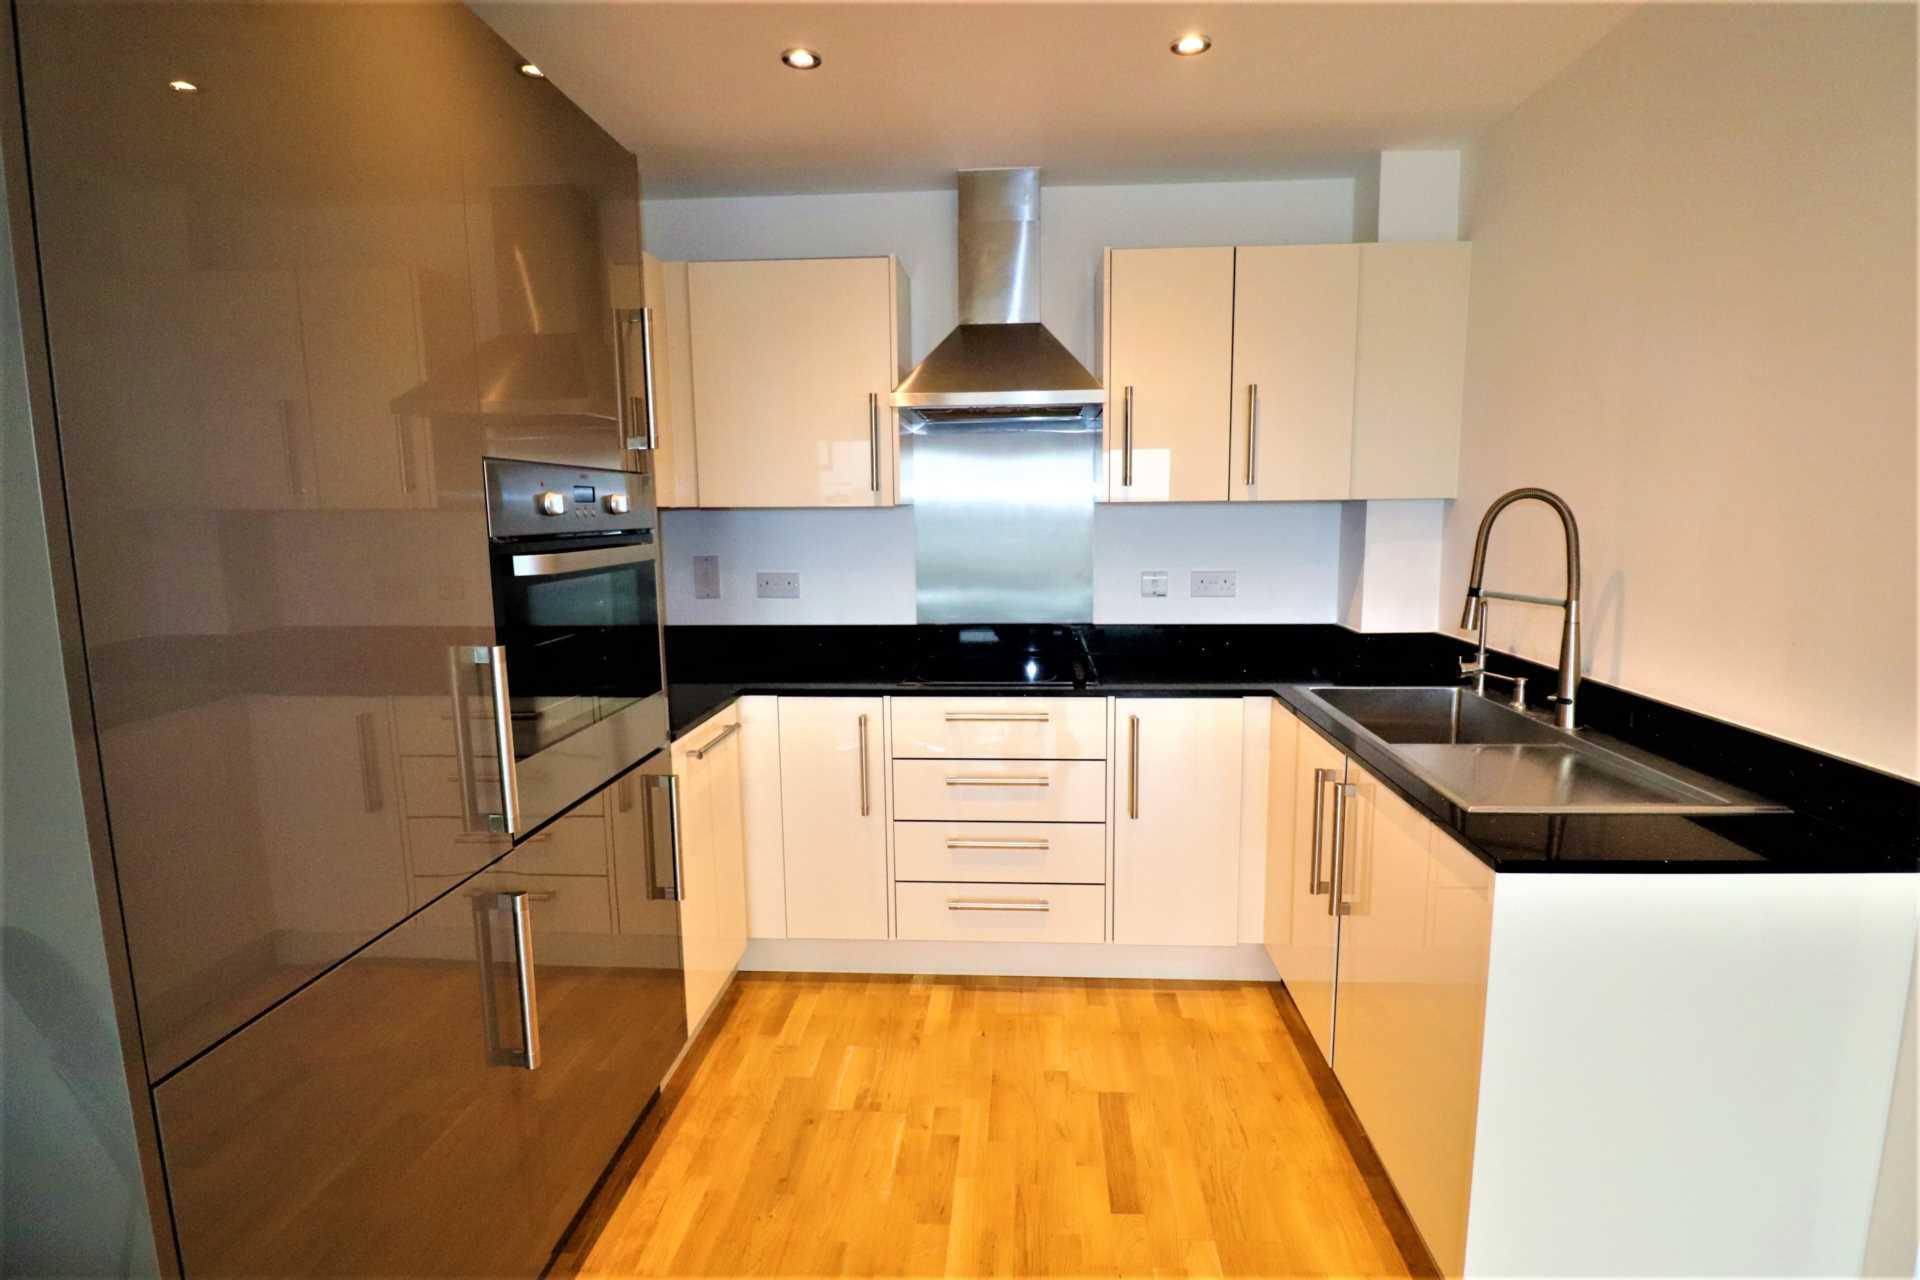 Homes 4 You Kent - 1 Bedroom Flat, Mill Pond Road, Dartford